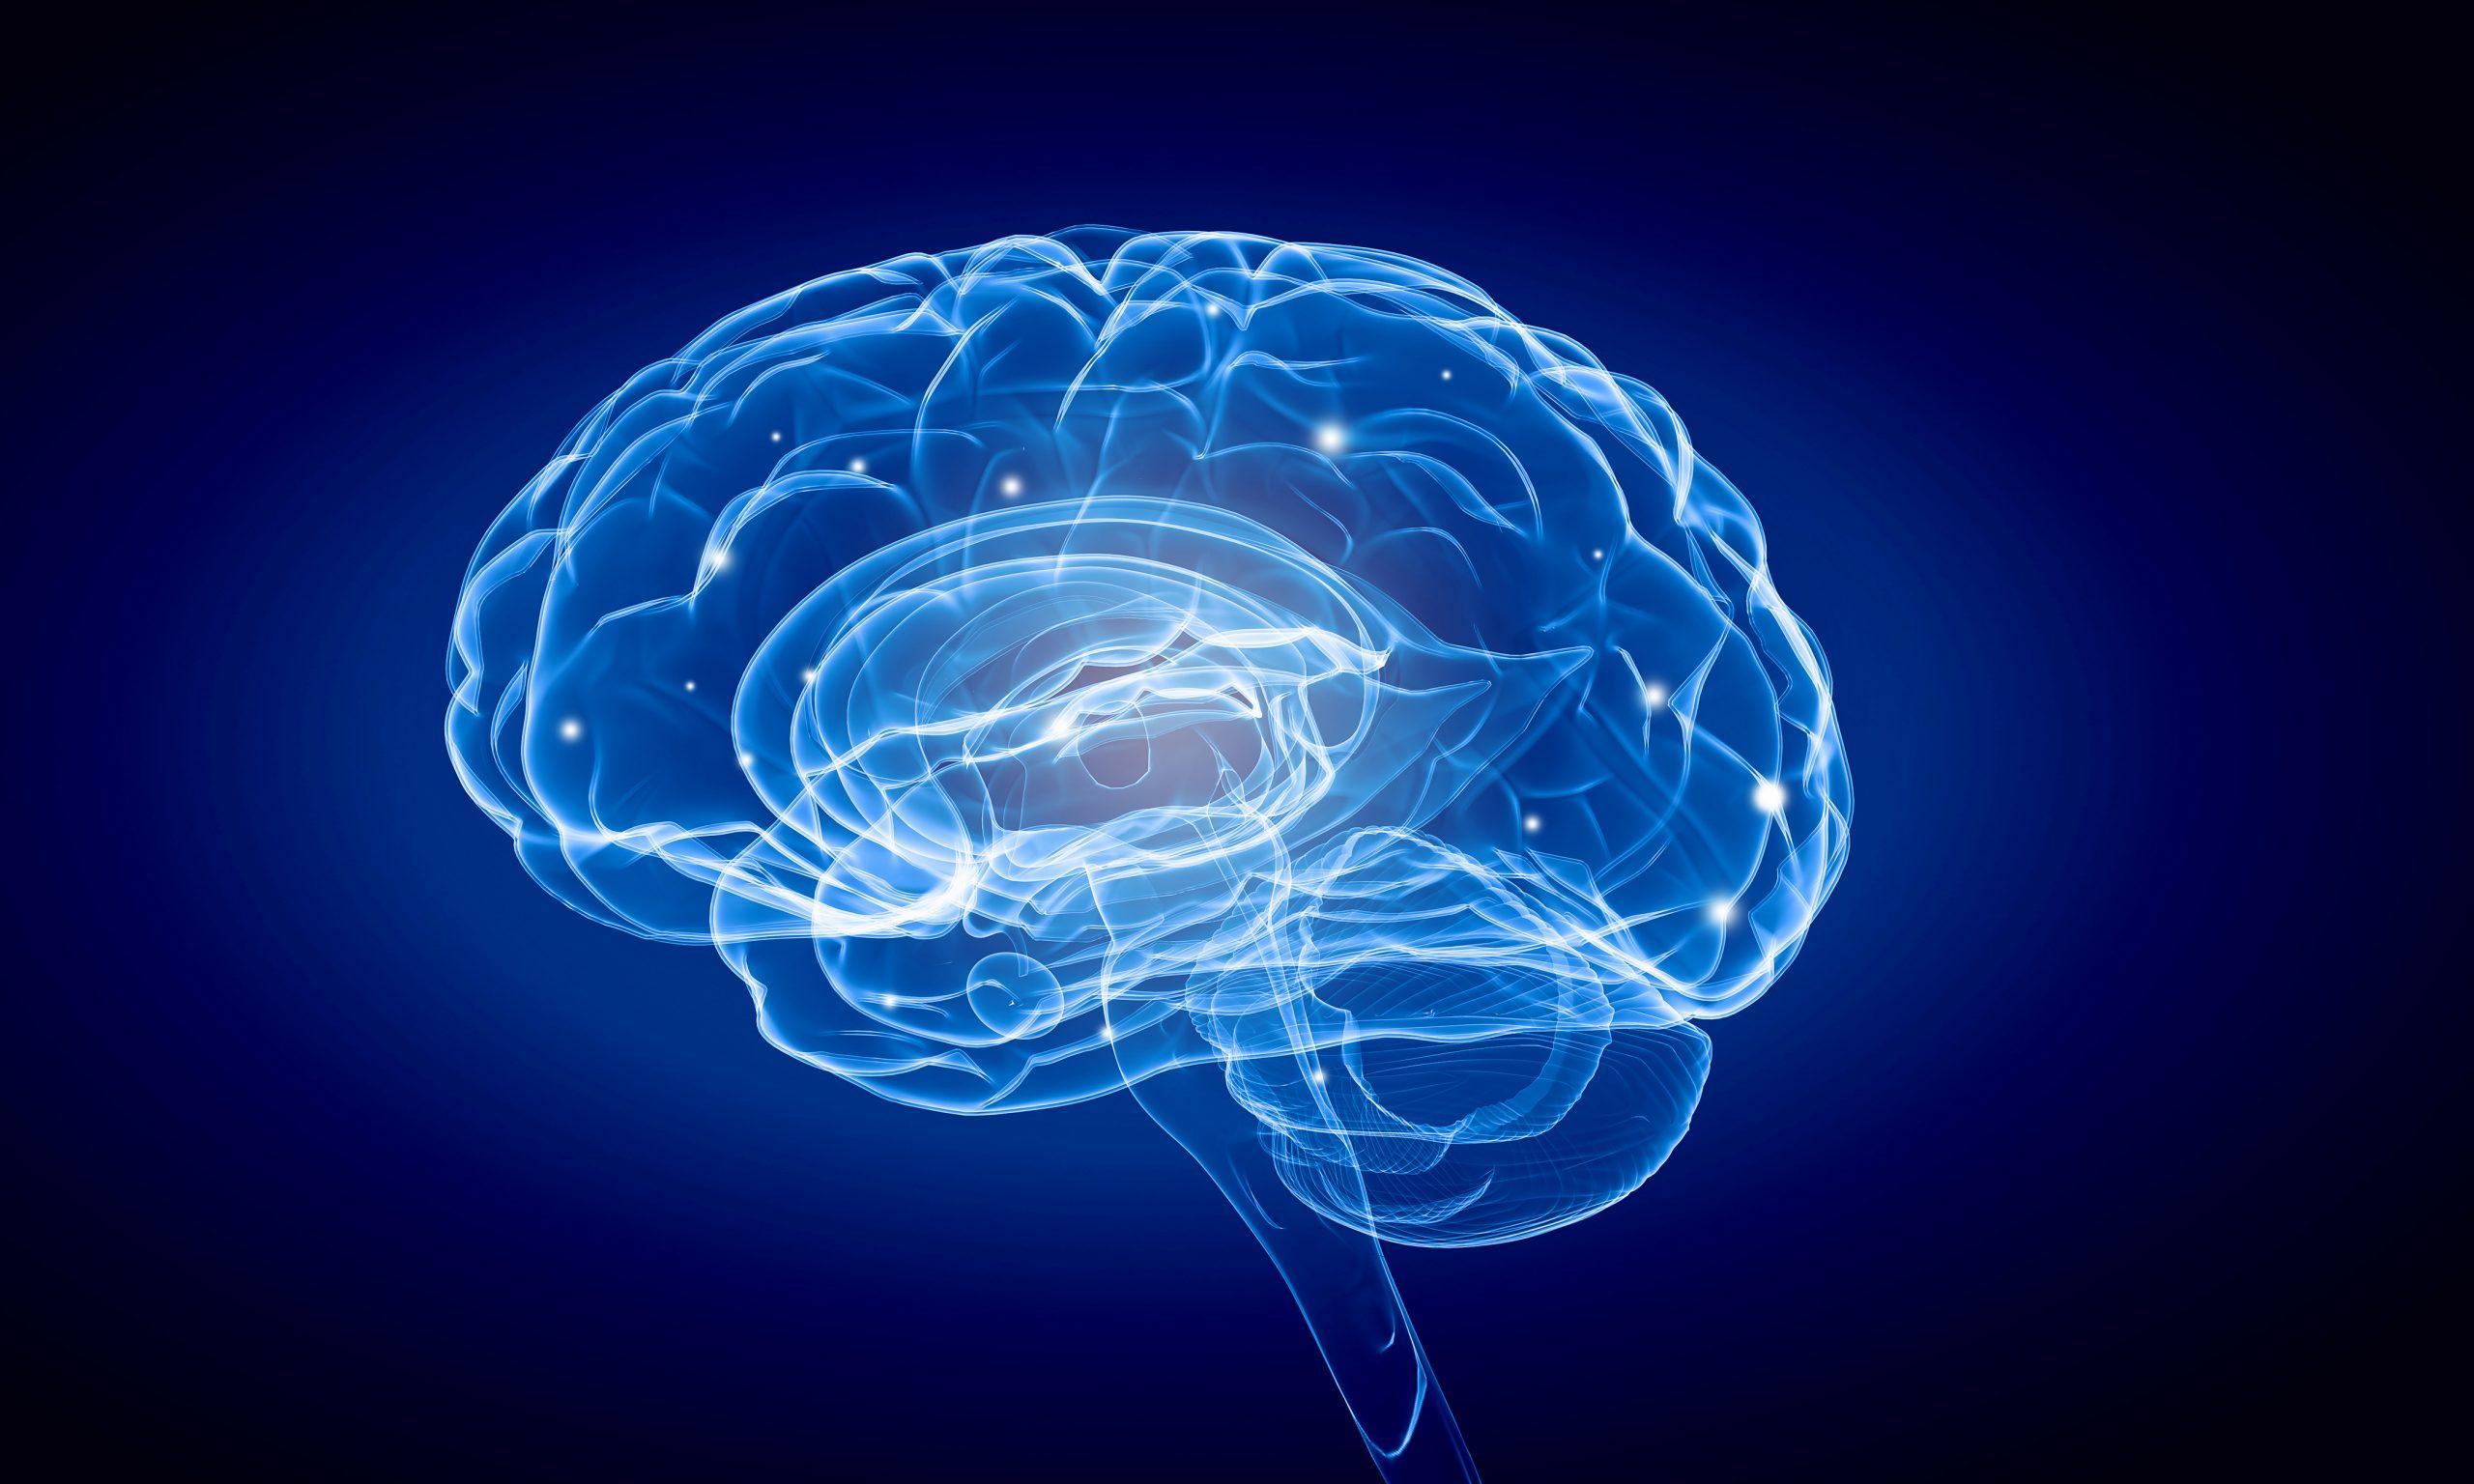 Coronavirus and the brain: Diagnosing and treating COVID-19's neurological effects